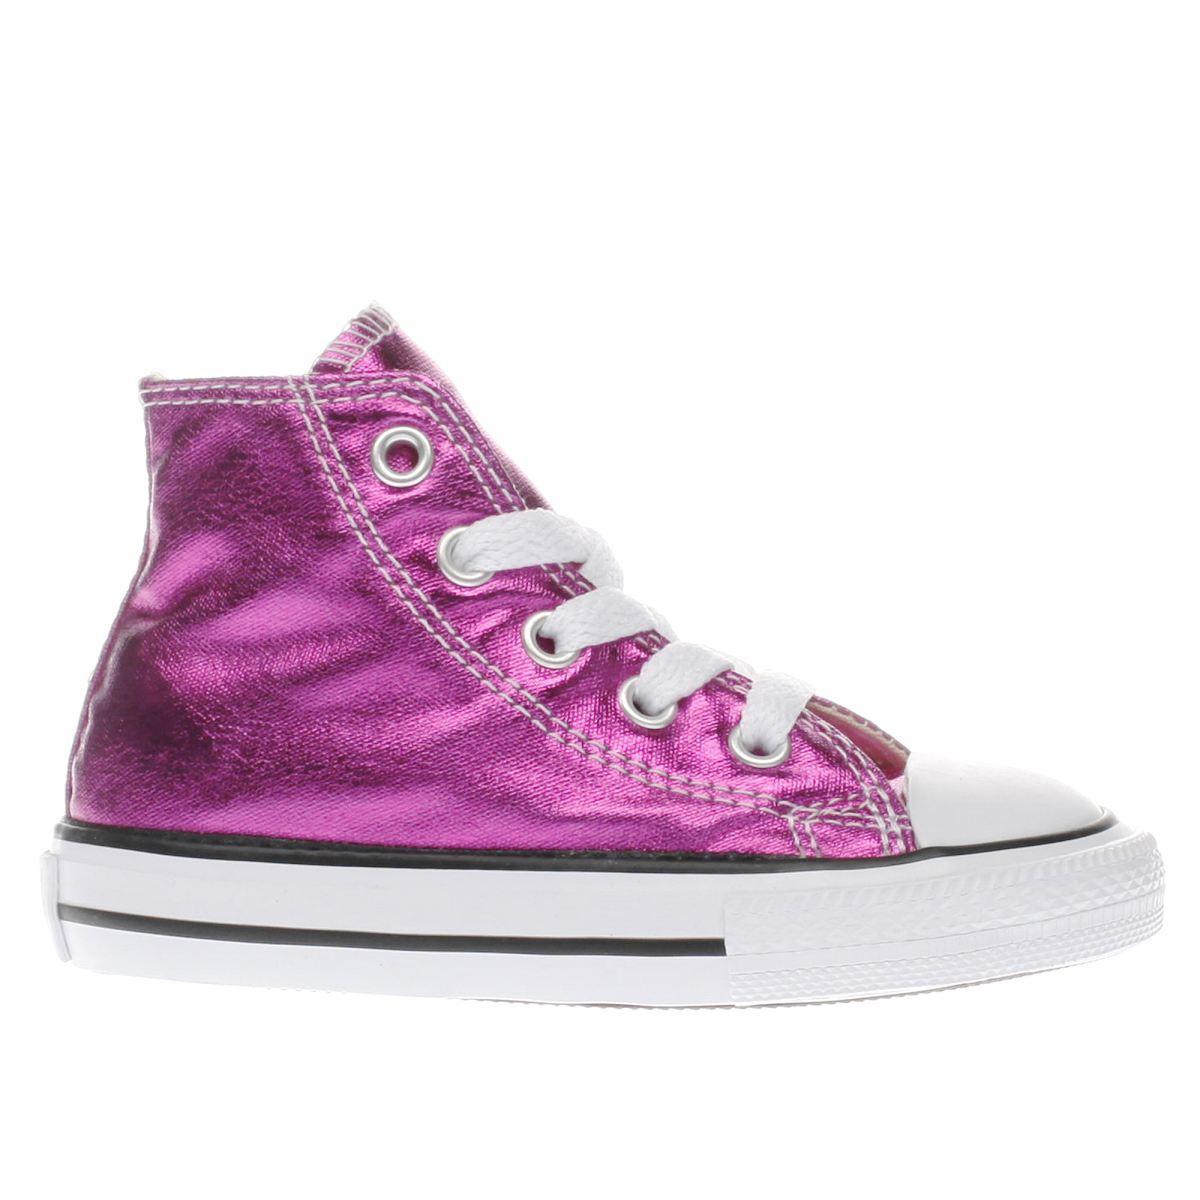 Converse Pink Chuck Taylor All Star Hi Girls Junior Trainers